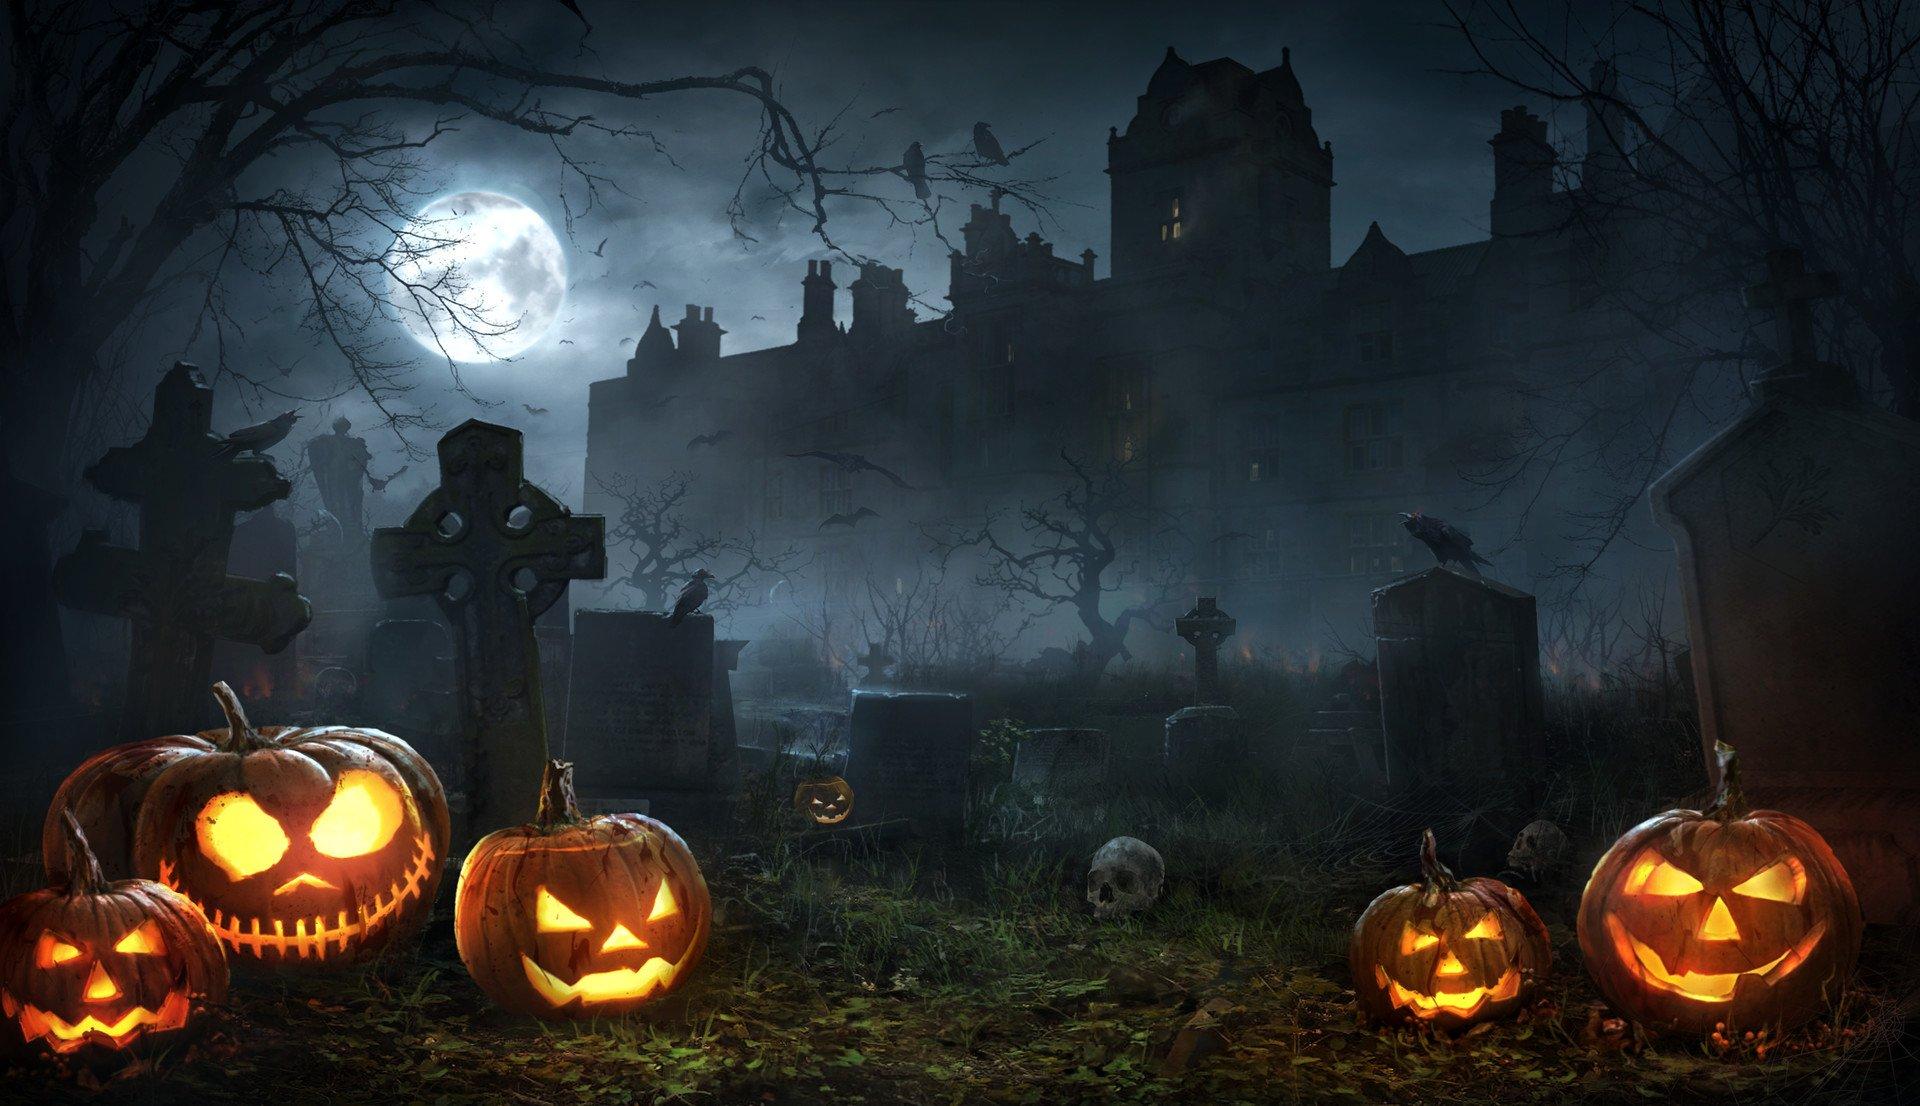 Halloween costume contest bachelor forum